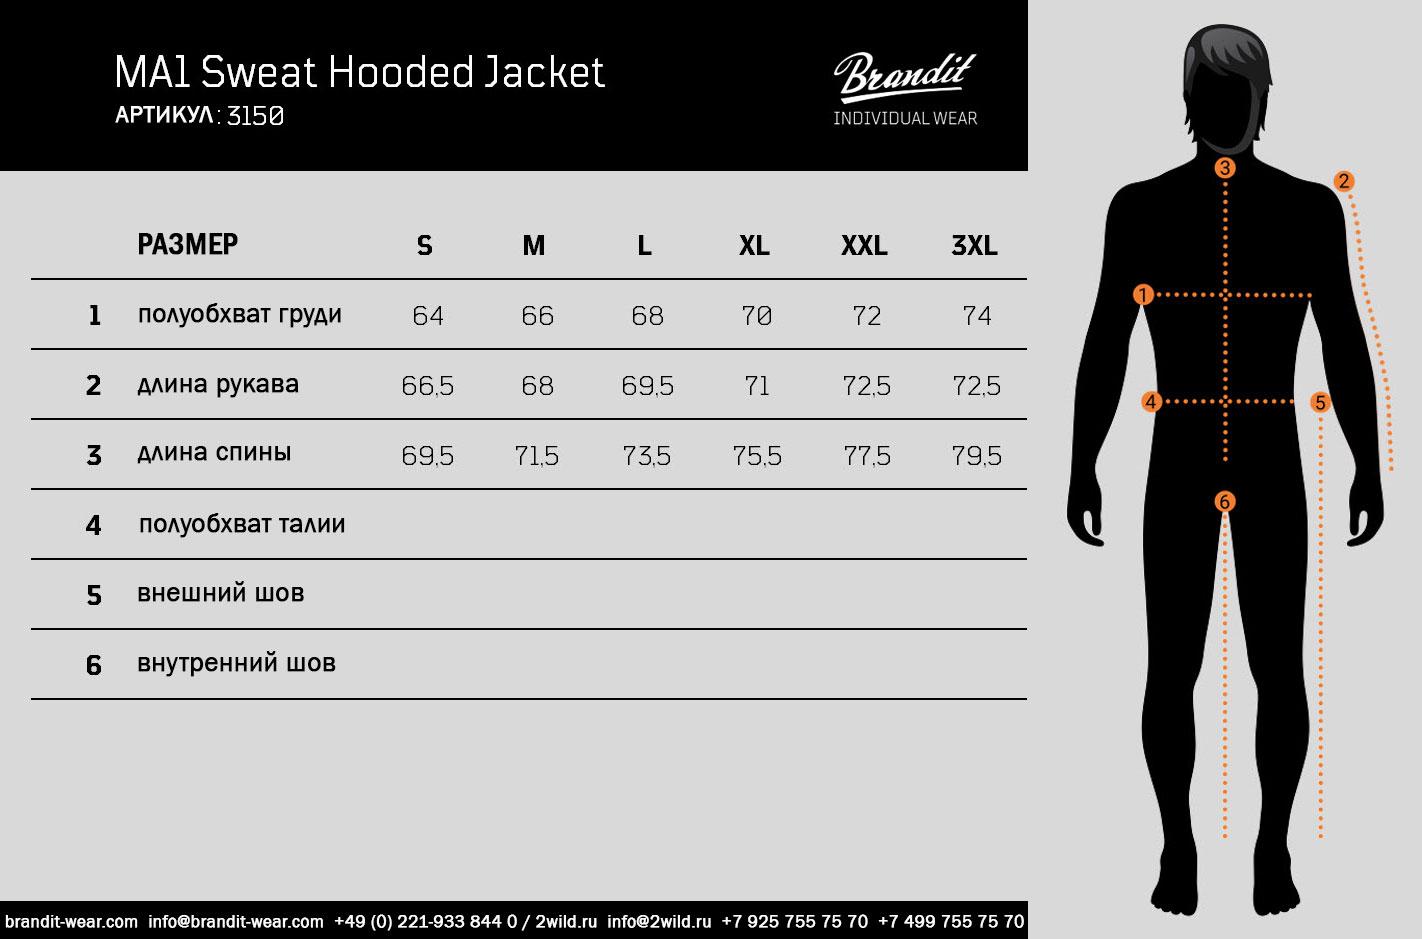 Куртка Brandit MA1 Sweat-Hooded-Jacket размеры